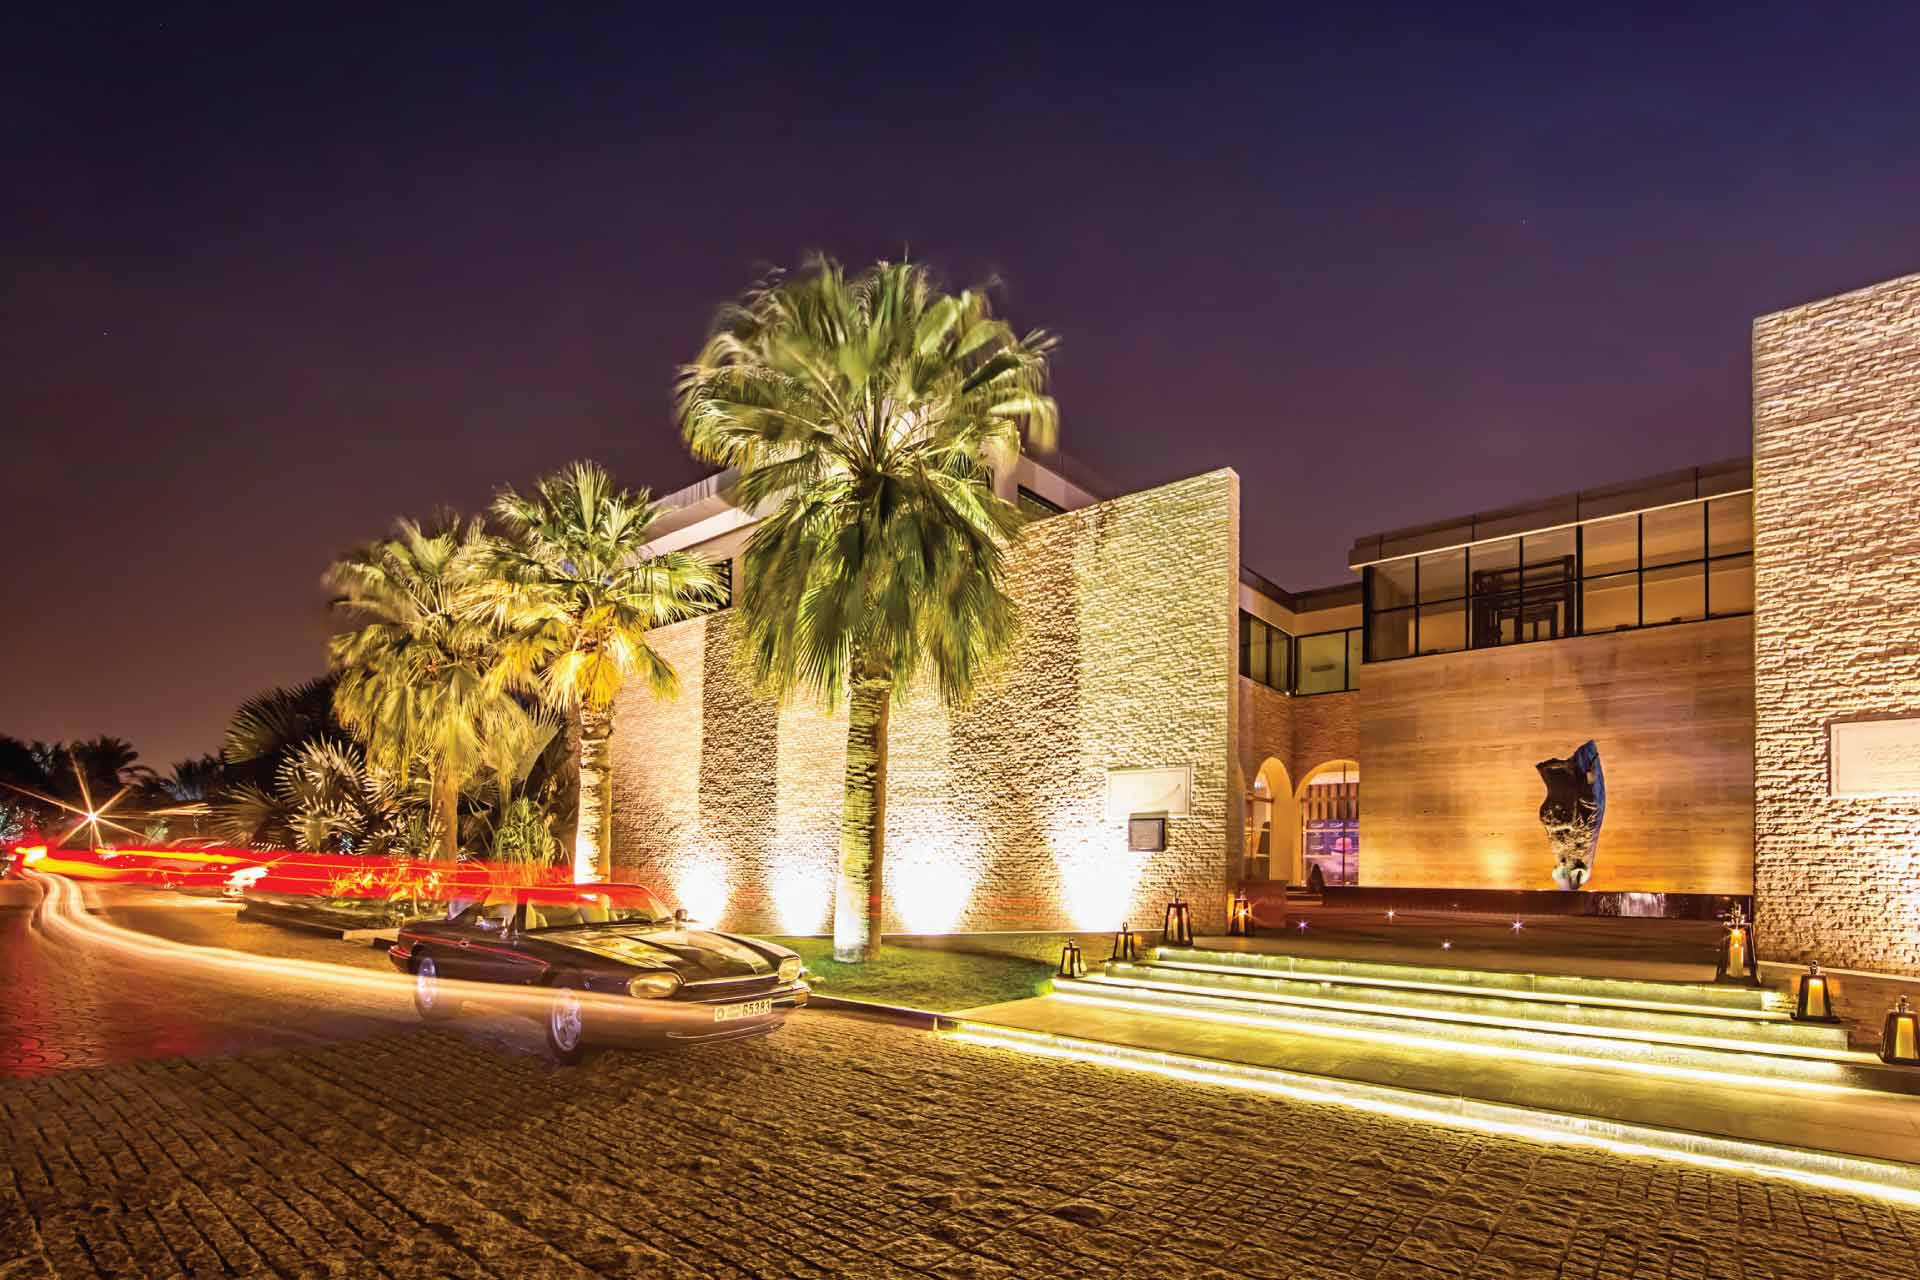 Deluxe hotel hotel de luxe htel 5 toiles hotel deluxe for List of 5 star hotels in dubai